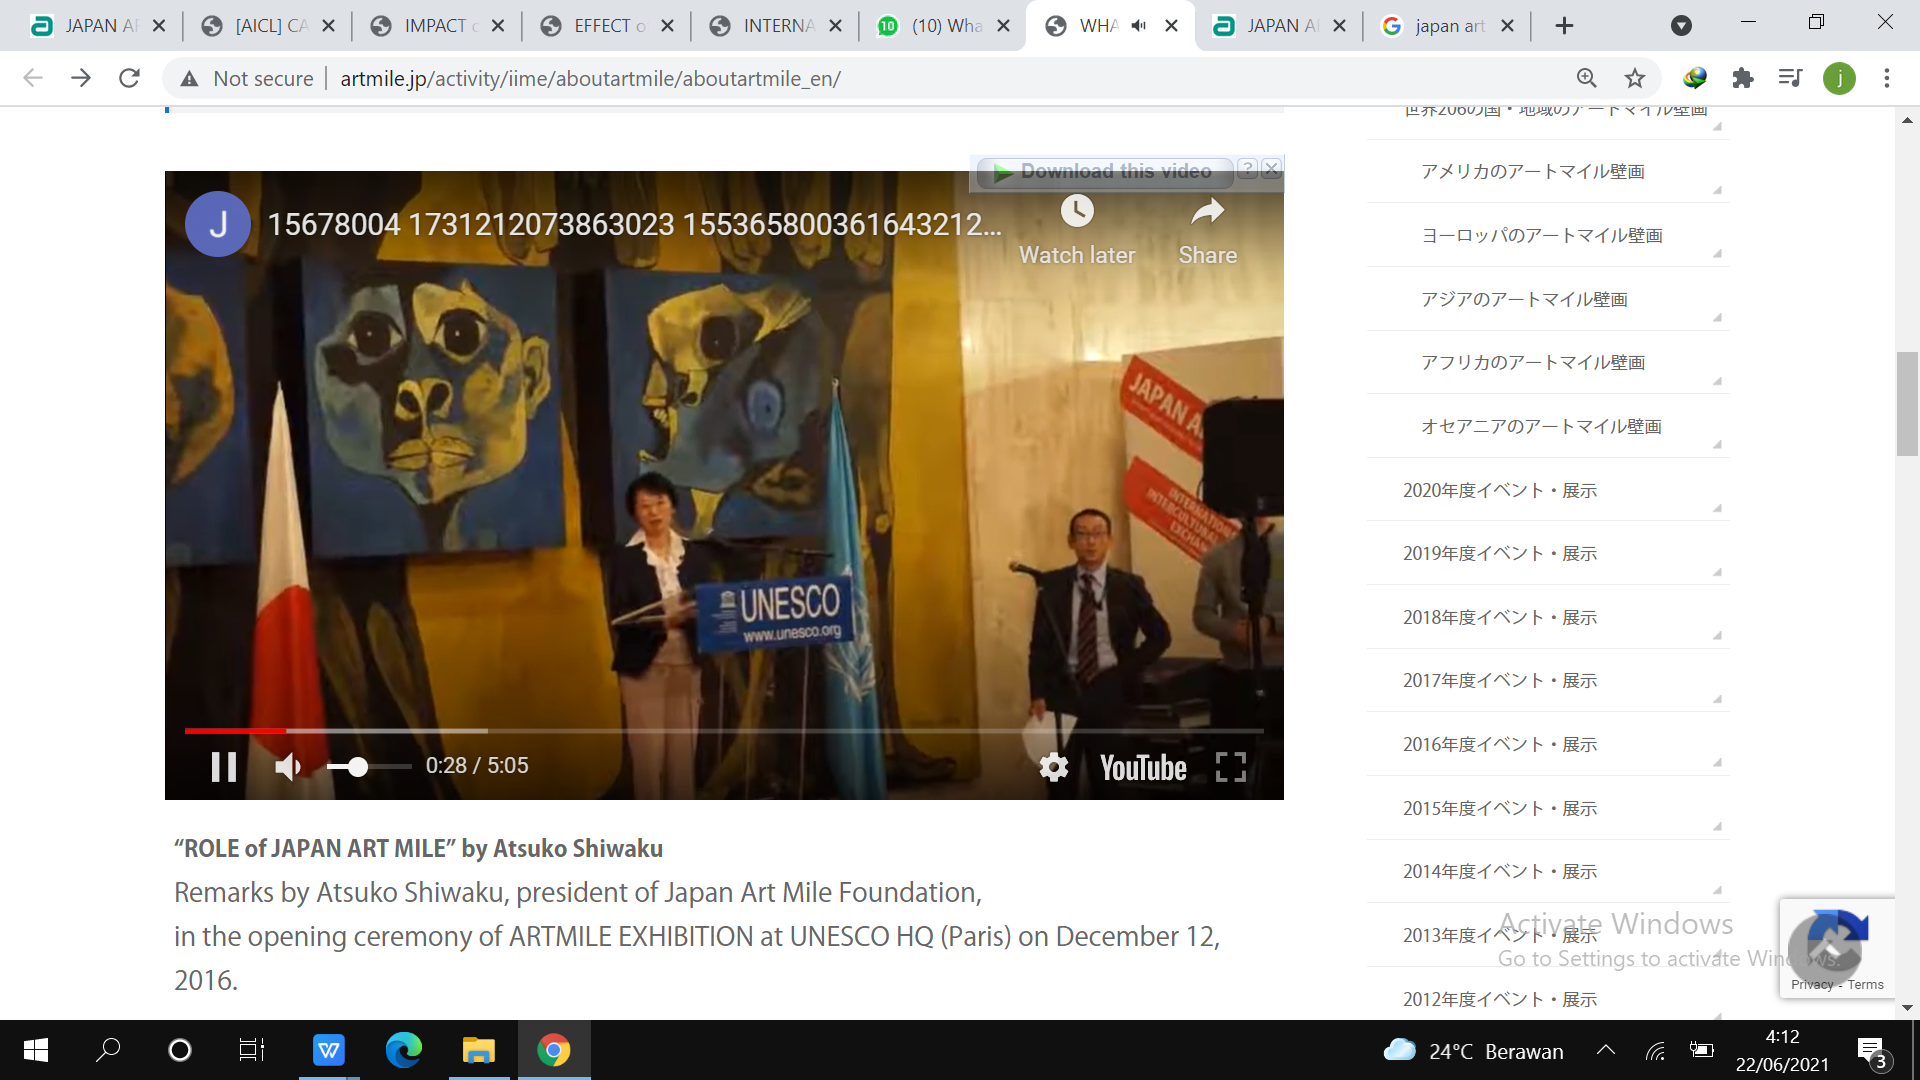 Kata sambutan oleh Atsuko Shiwaku, Presiden Japan Art Mile Foundation, pada acara pembukaan pameran ARTMILE di markas besar UNESCO di Paris, 12 December 2016 (dokumentasi Youtube)